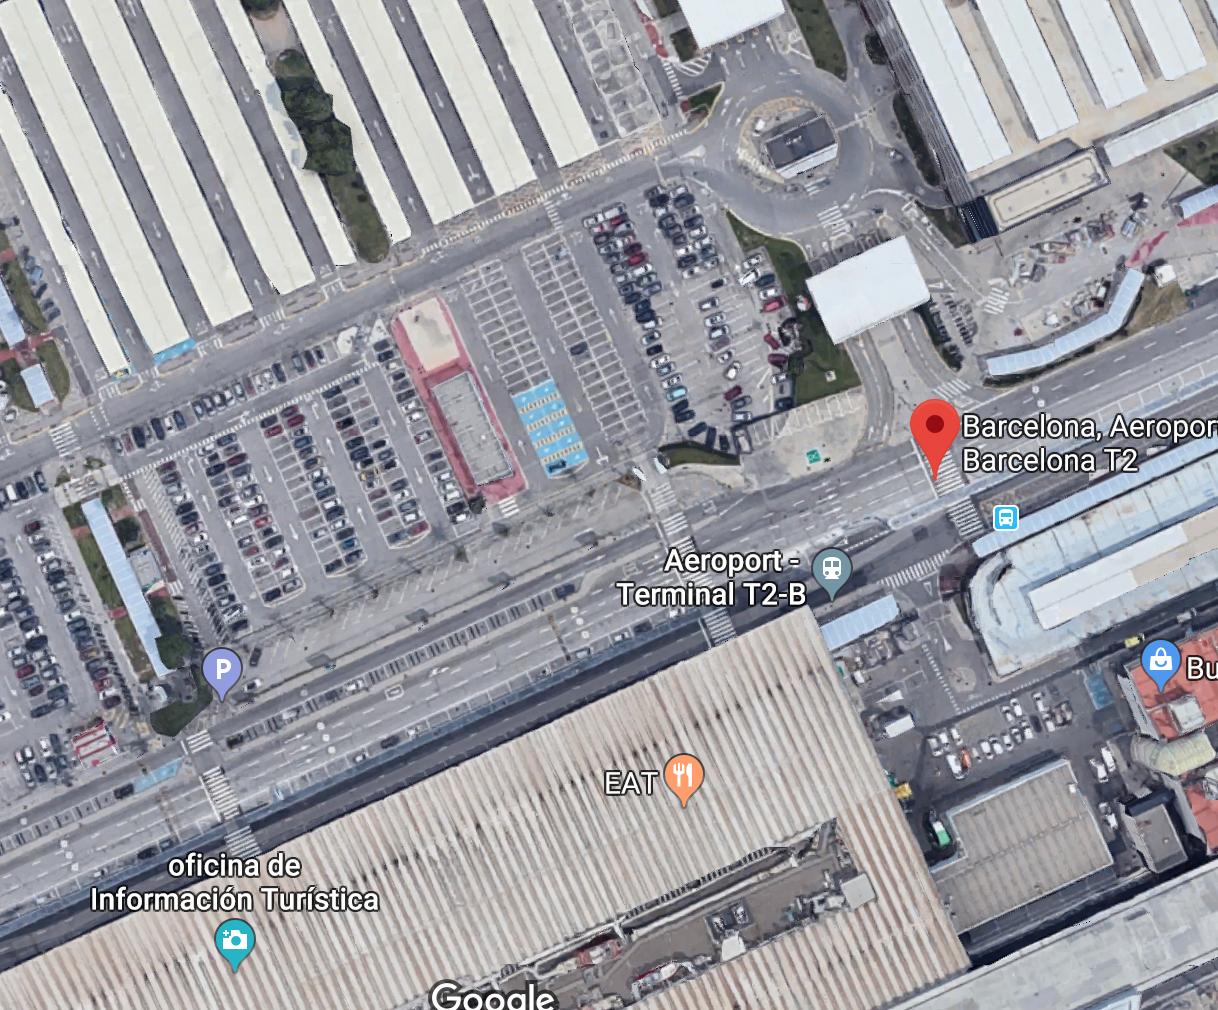 Aeropuerto BCN - Terminal 2